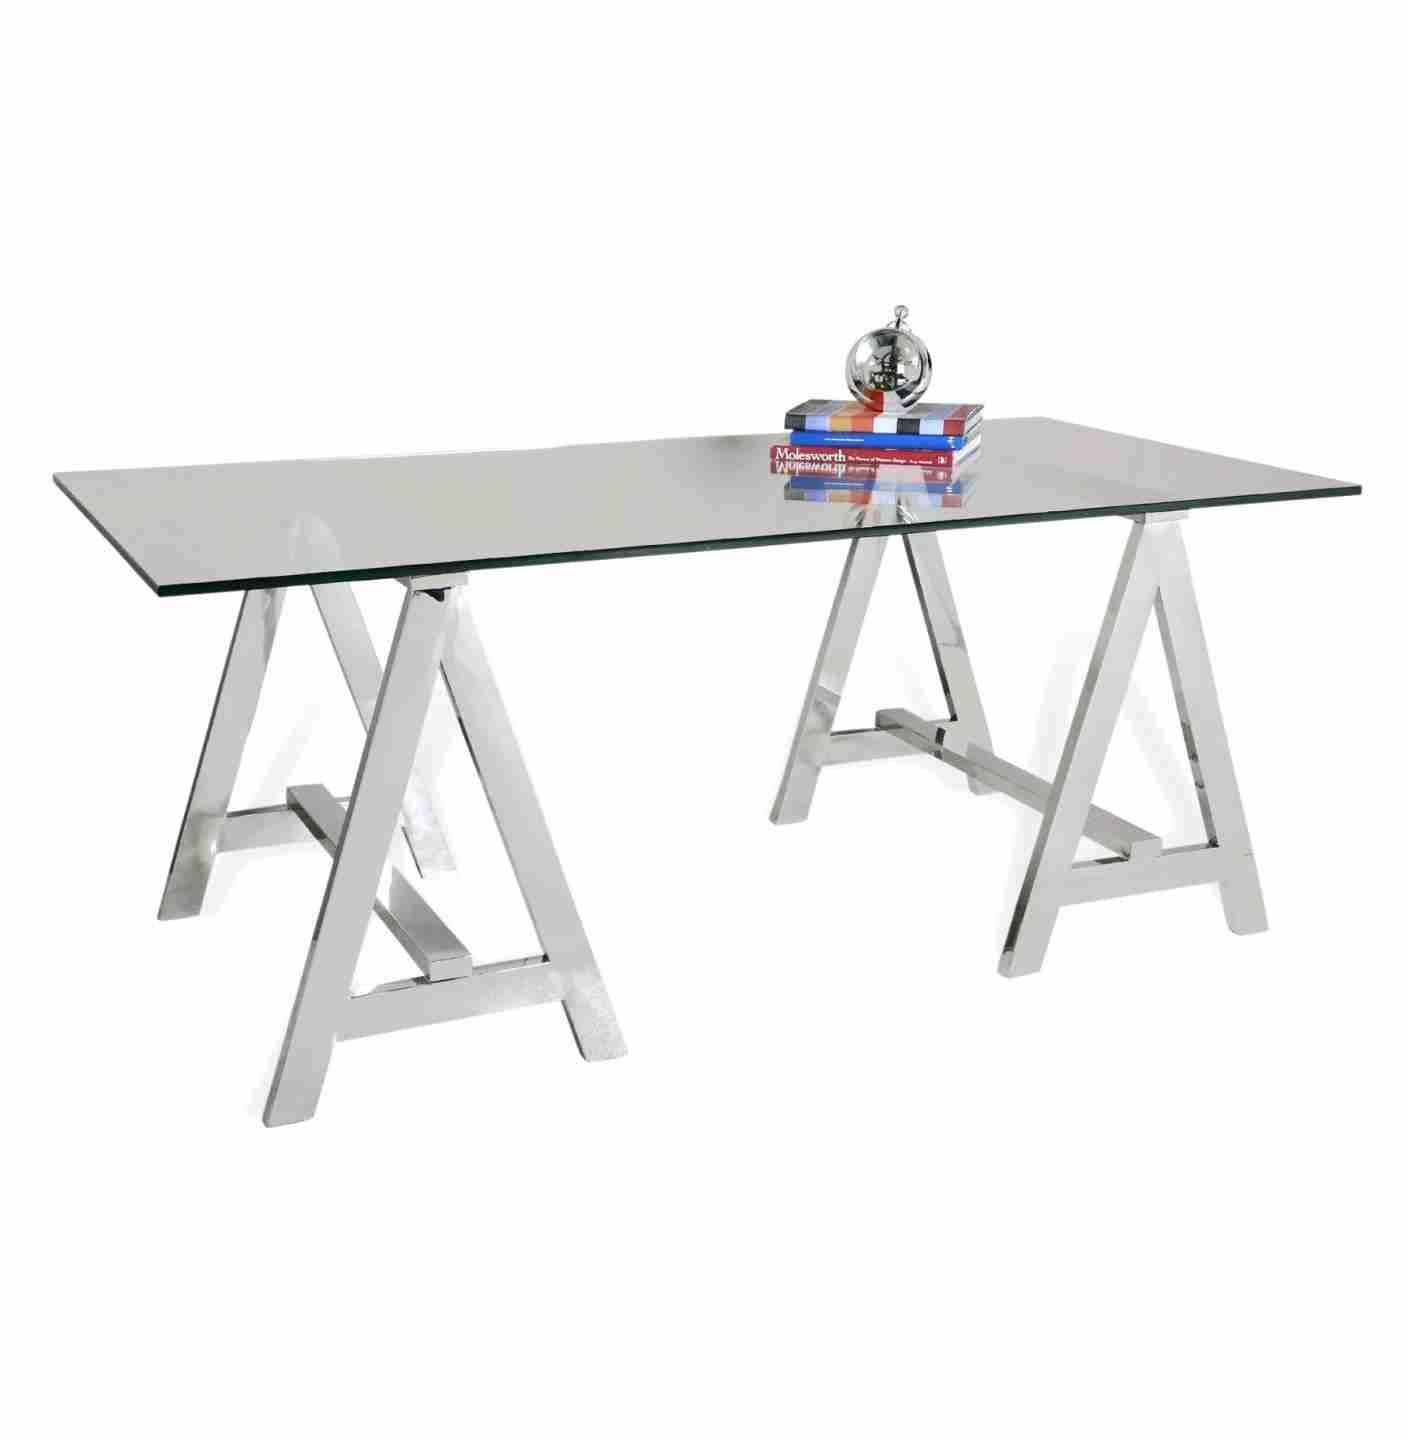 post glass home office desks. New Post Trending-metal Pipe Desk Legs-Visit-entermp3.info · LegsGlass DeskHome OfficesOffice Glass Home Office Desks